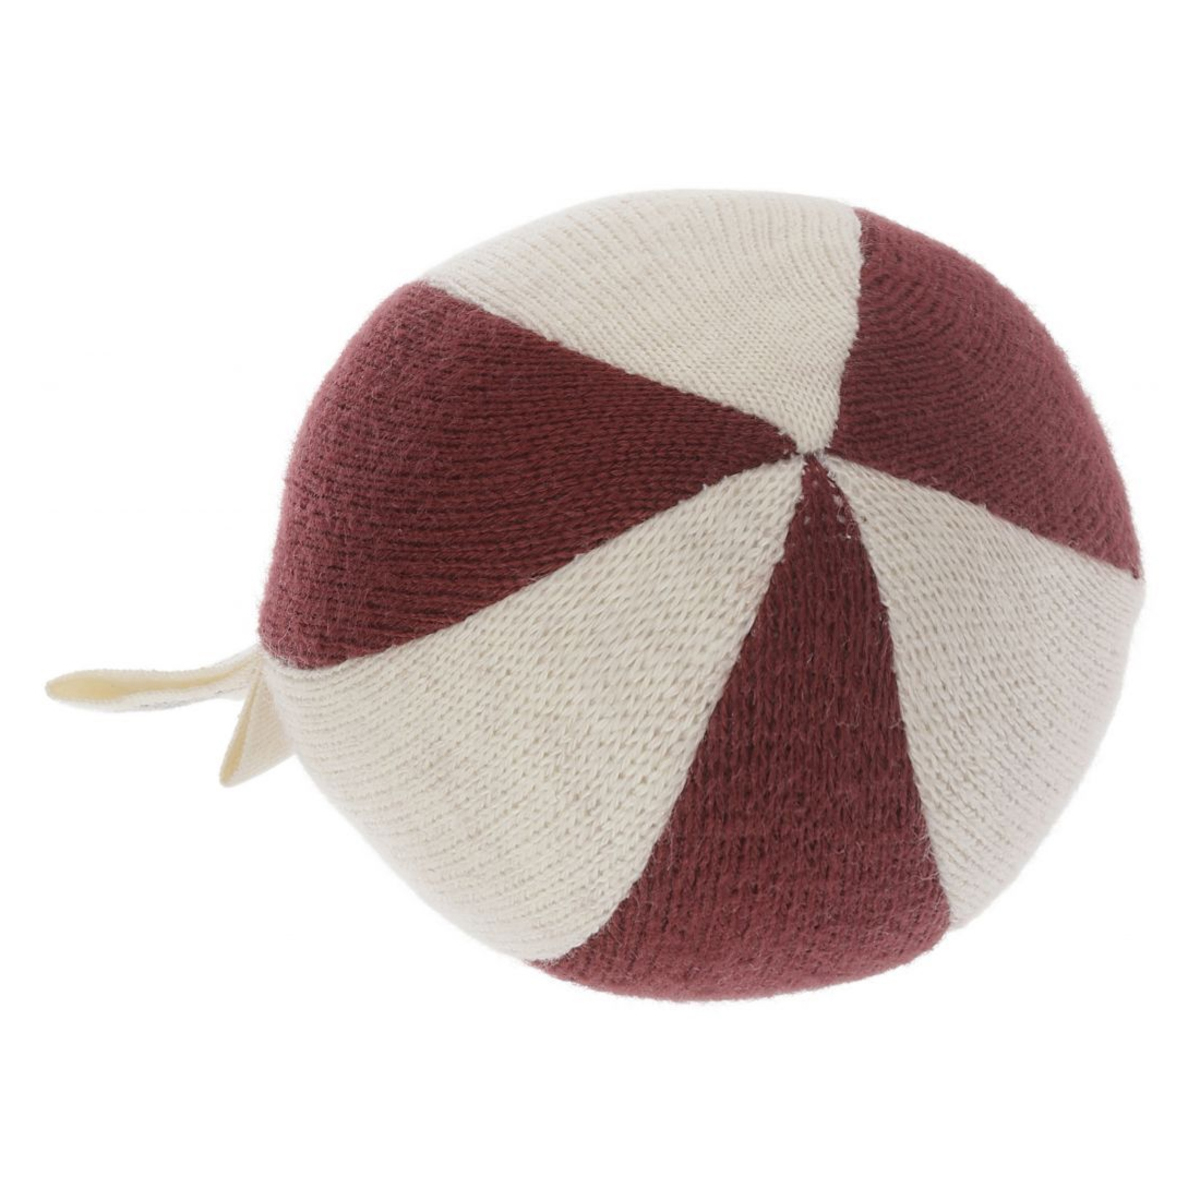 Hochet Hochet Ballon - Bordeaux Hochet Ballon - Bordeaux